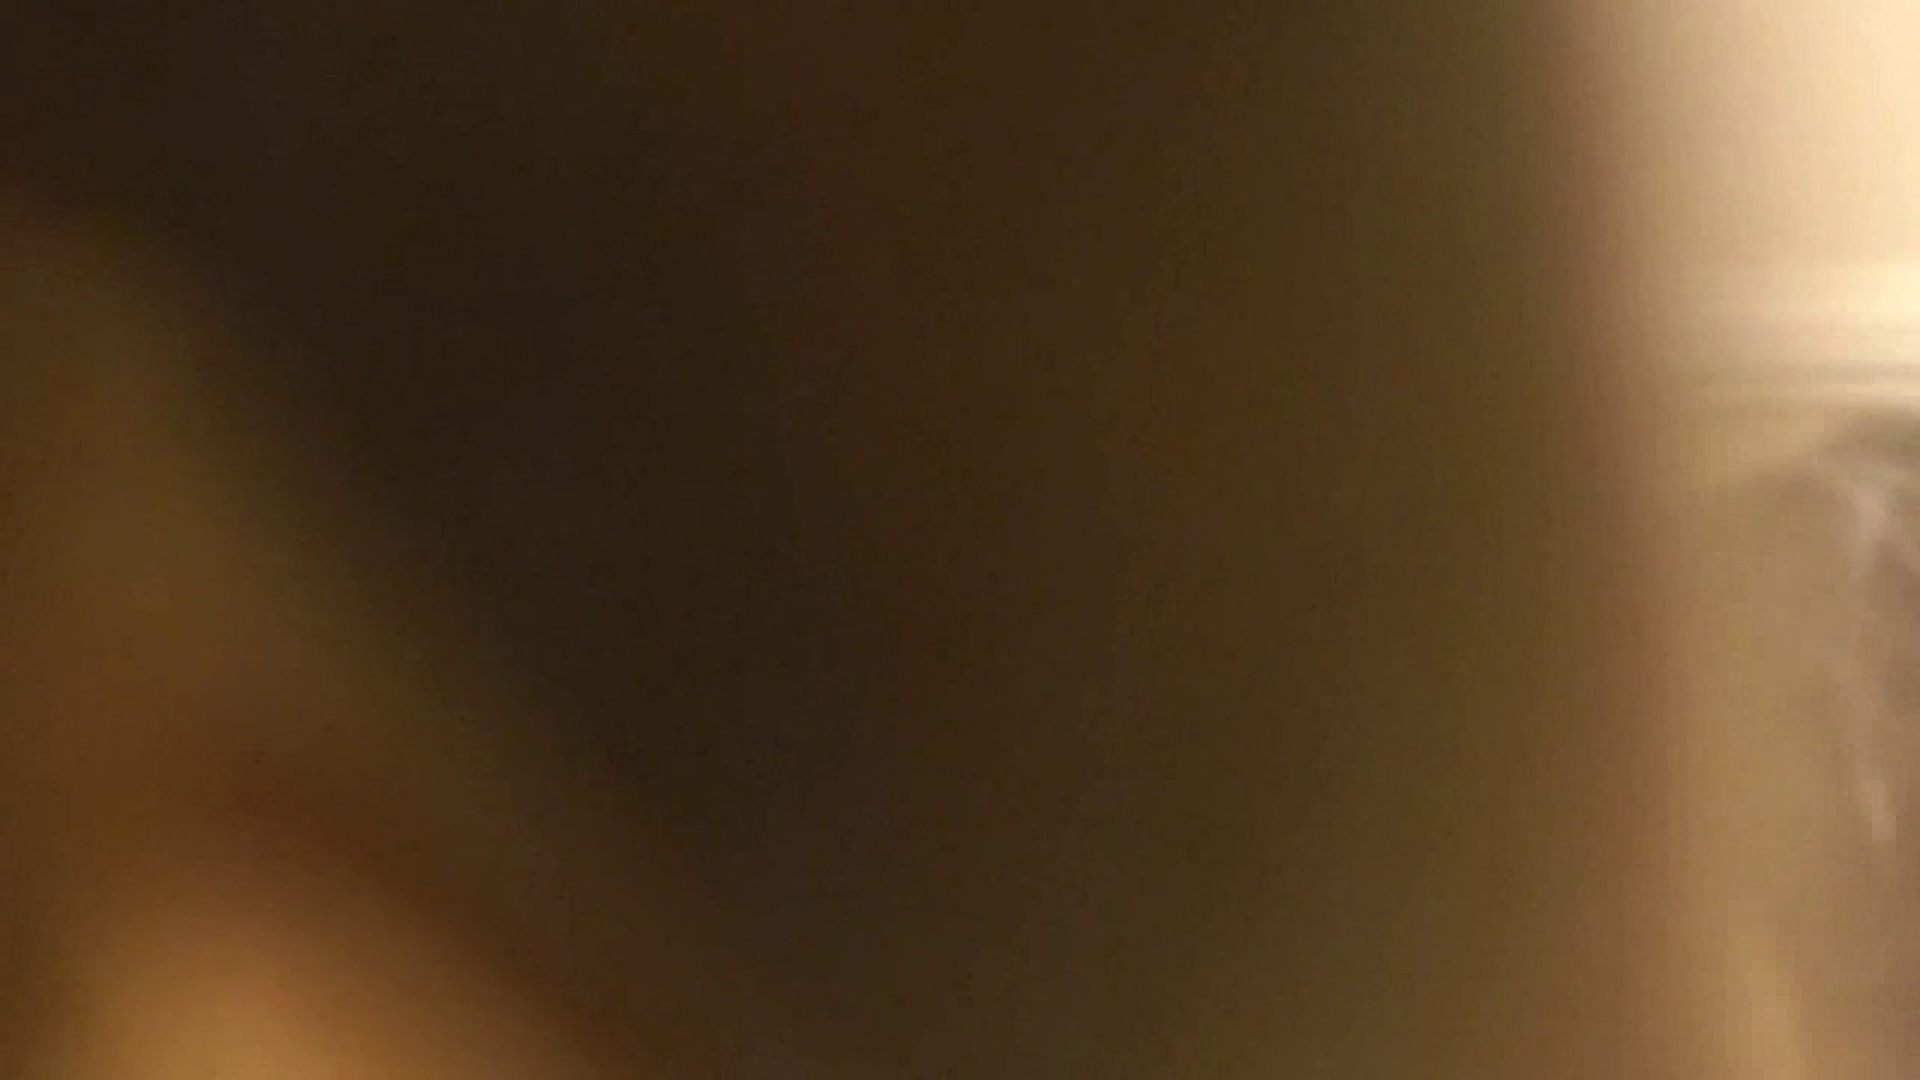 vol.1 Mayumi 窓越しに入浴シーン撮影に成功 OLの実態 | 入浴中のオンナ  17pic 5